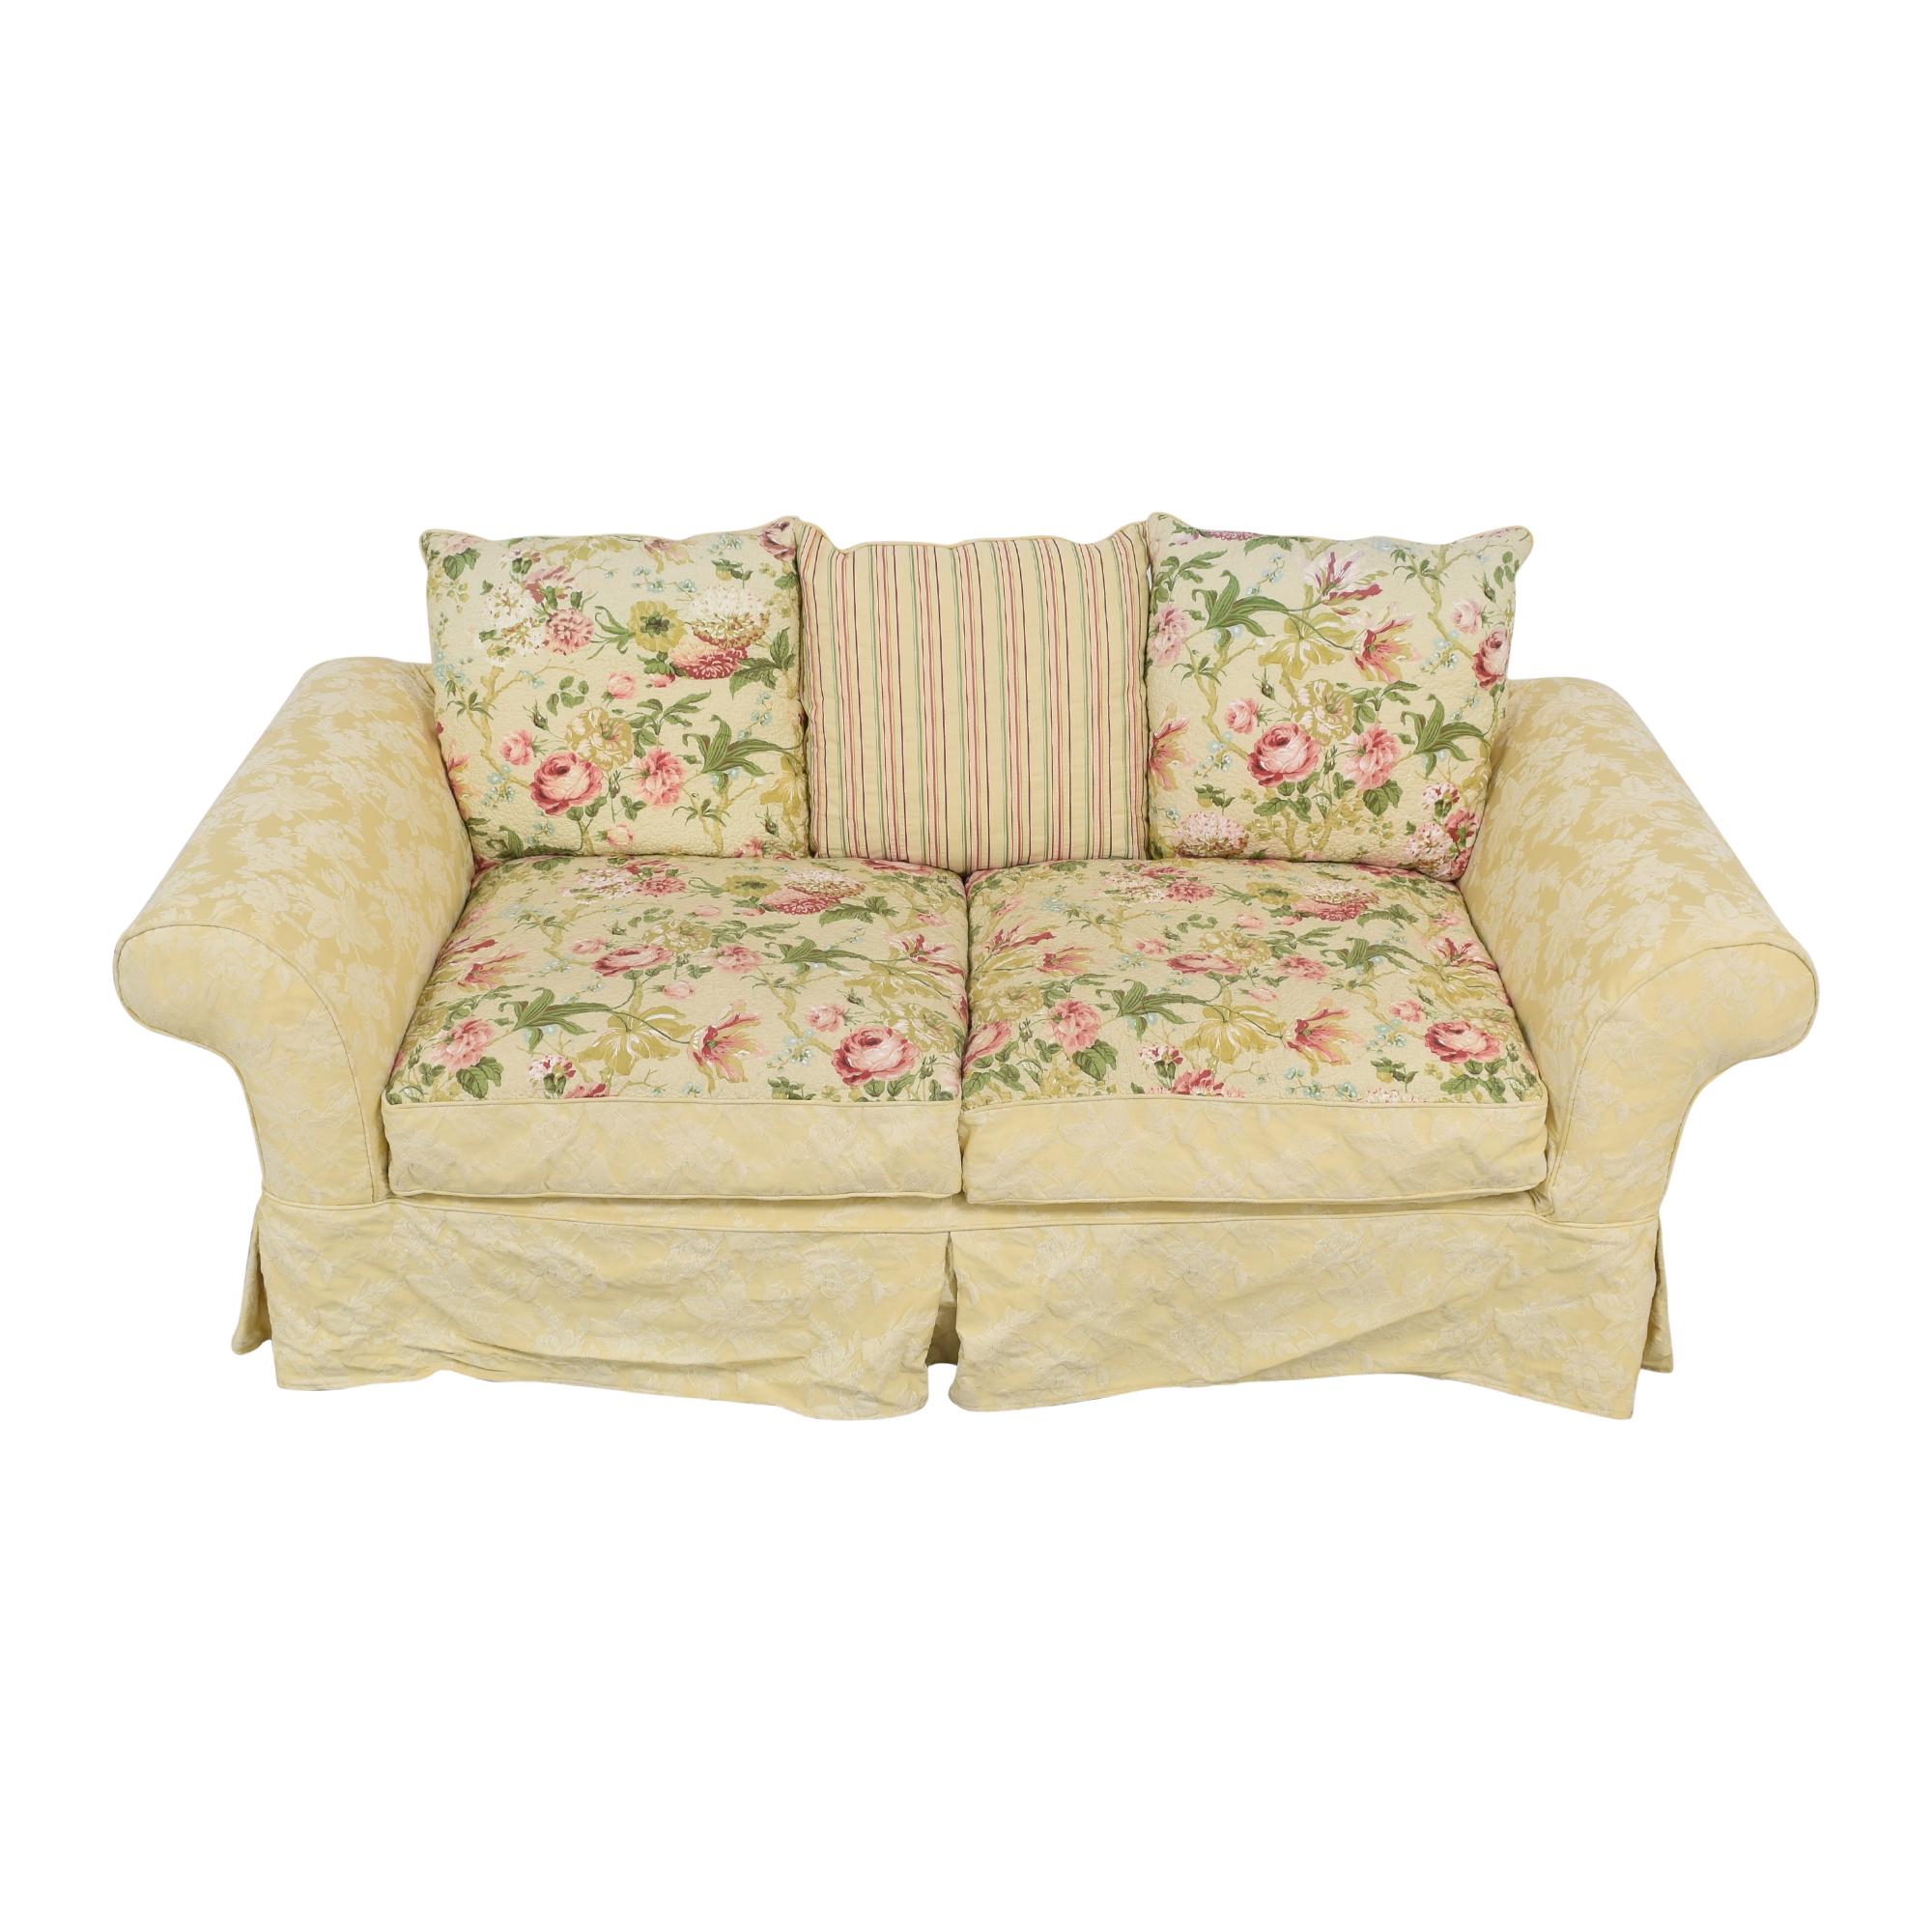 Domain Domain Multi-Patterned Sofa dimensions